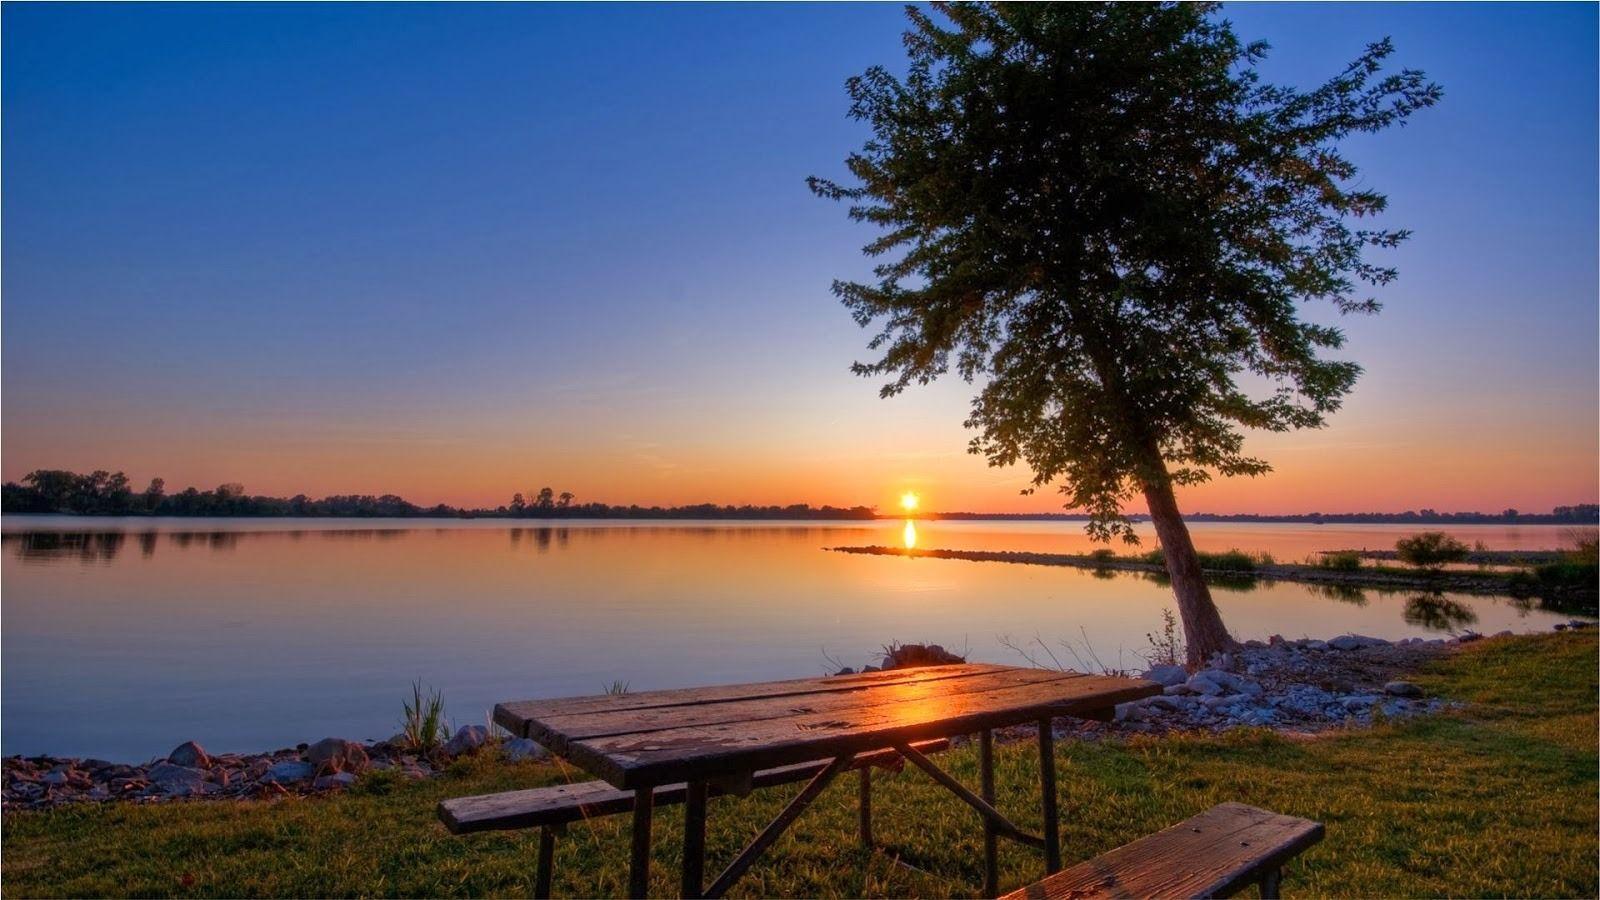 Download 6500 Koleksi Background Pemandangan Kualitas Hd HD Gratis